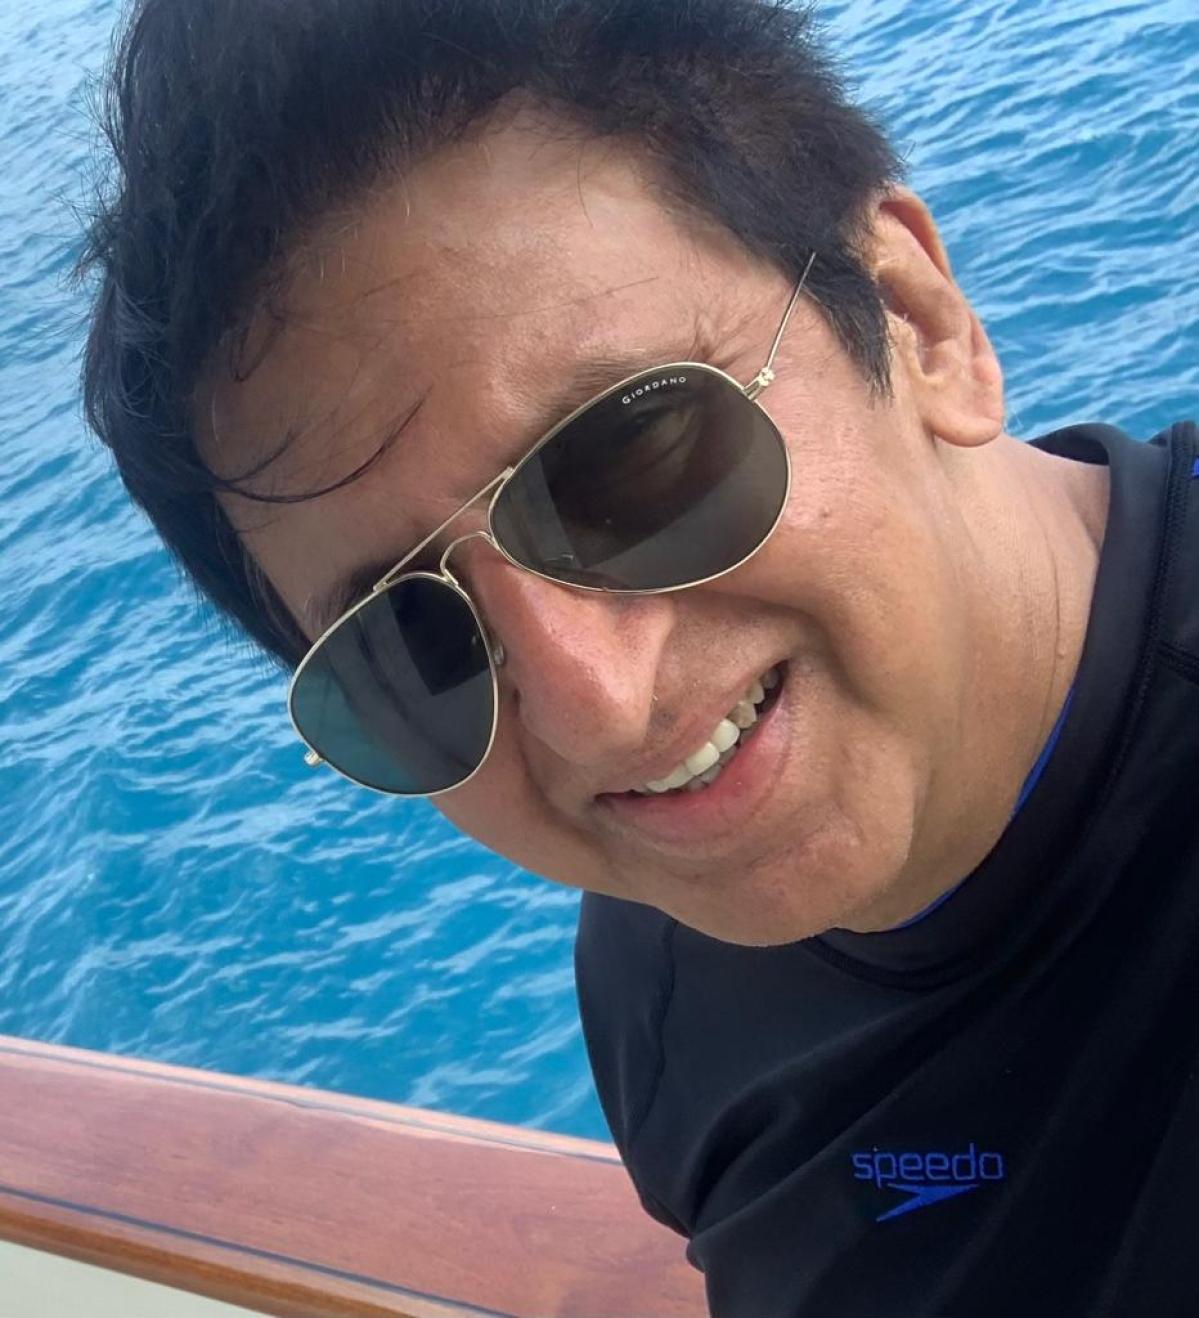 Tribute: Milkha Singh ran like a gazelle for TV film, 'Freedom Run', recalls ad filmmaker Kailash Surendranath